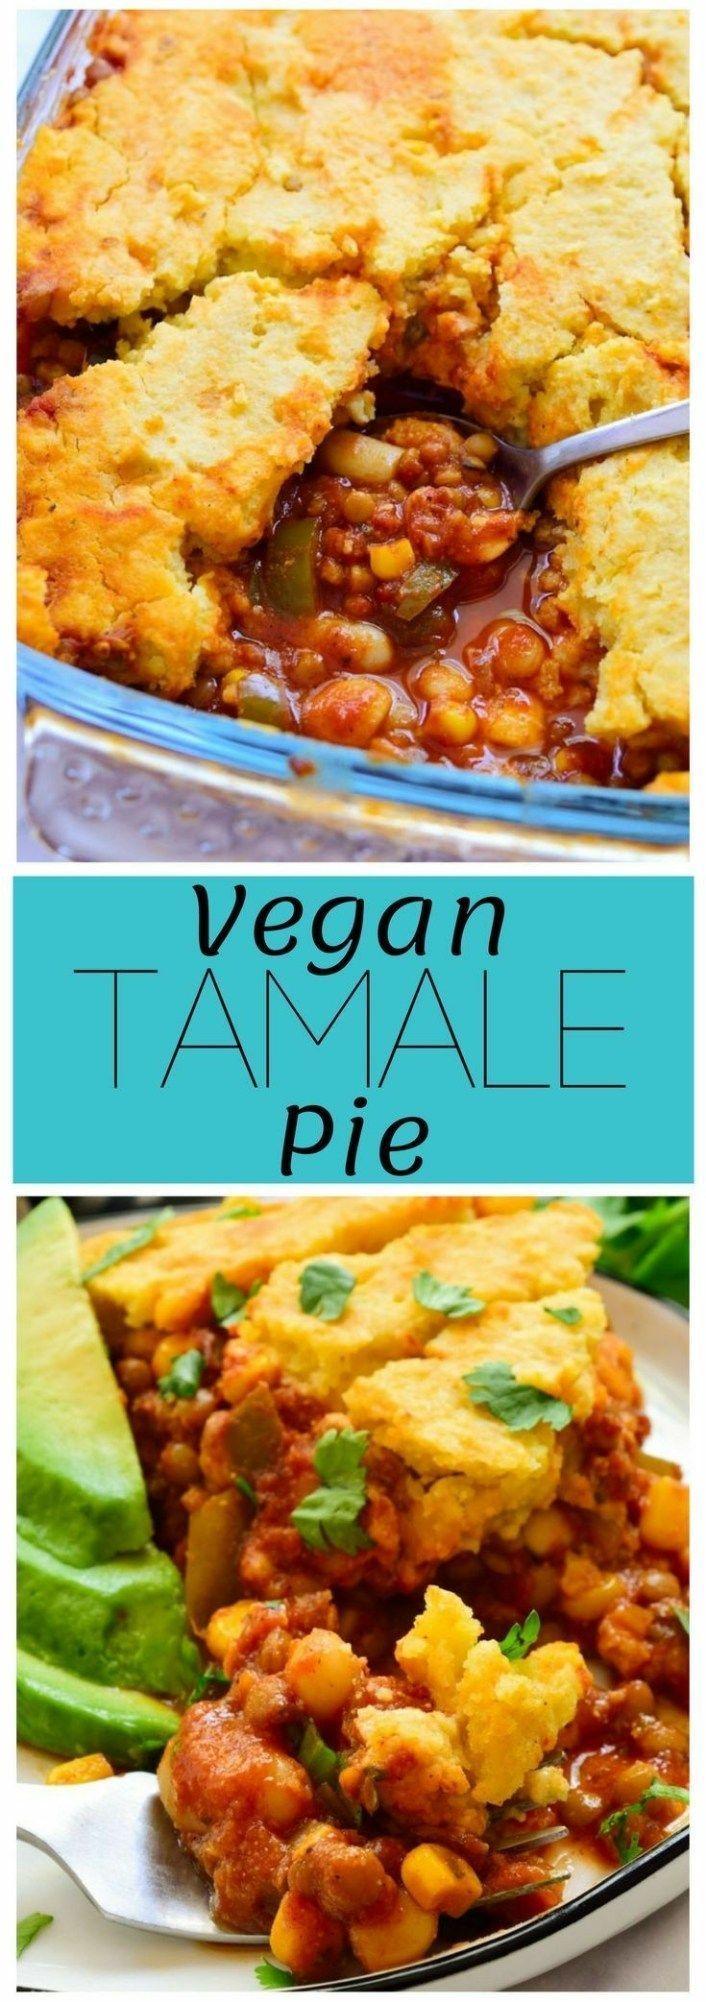 Vegan Tamale Pie In 2020 Mexican Food Recipes Authentic Vegan Tamales Tamale Pie